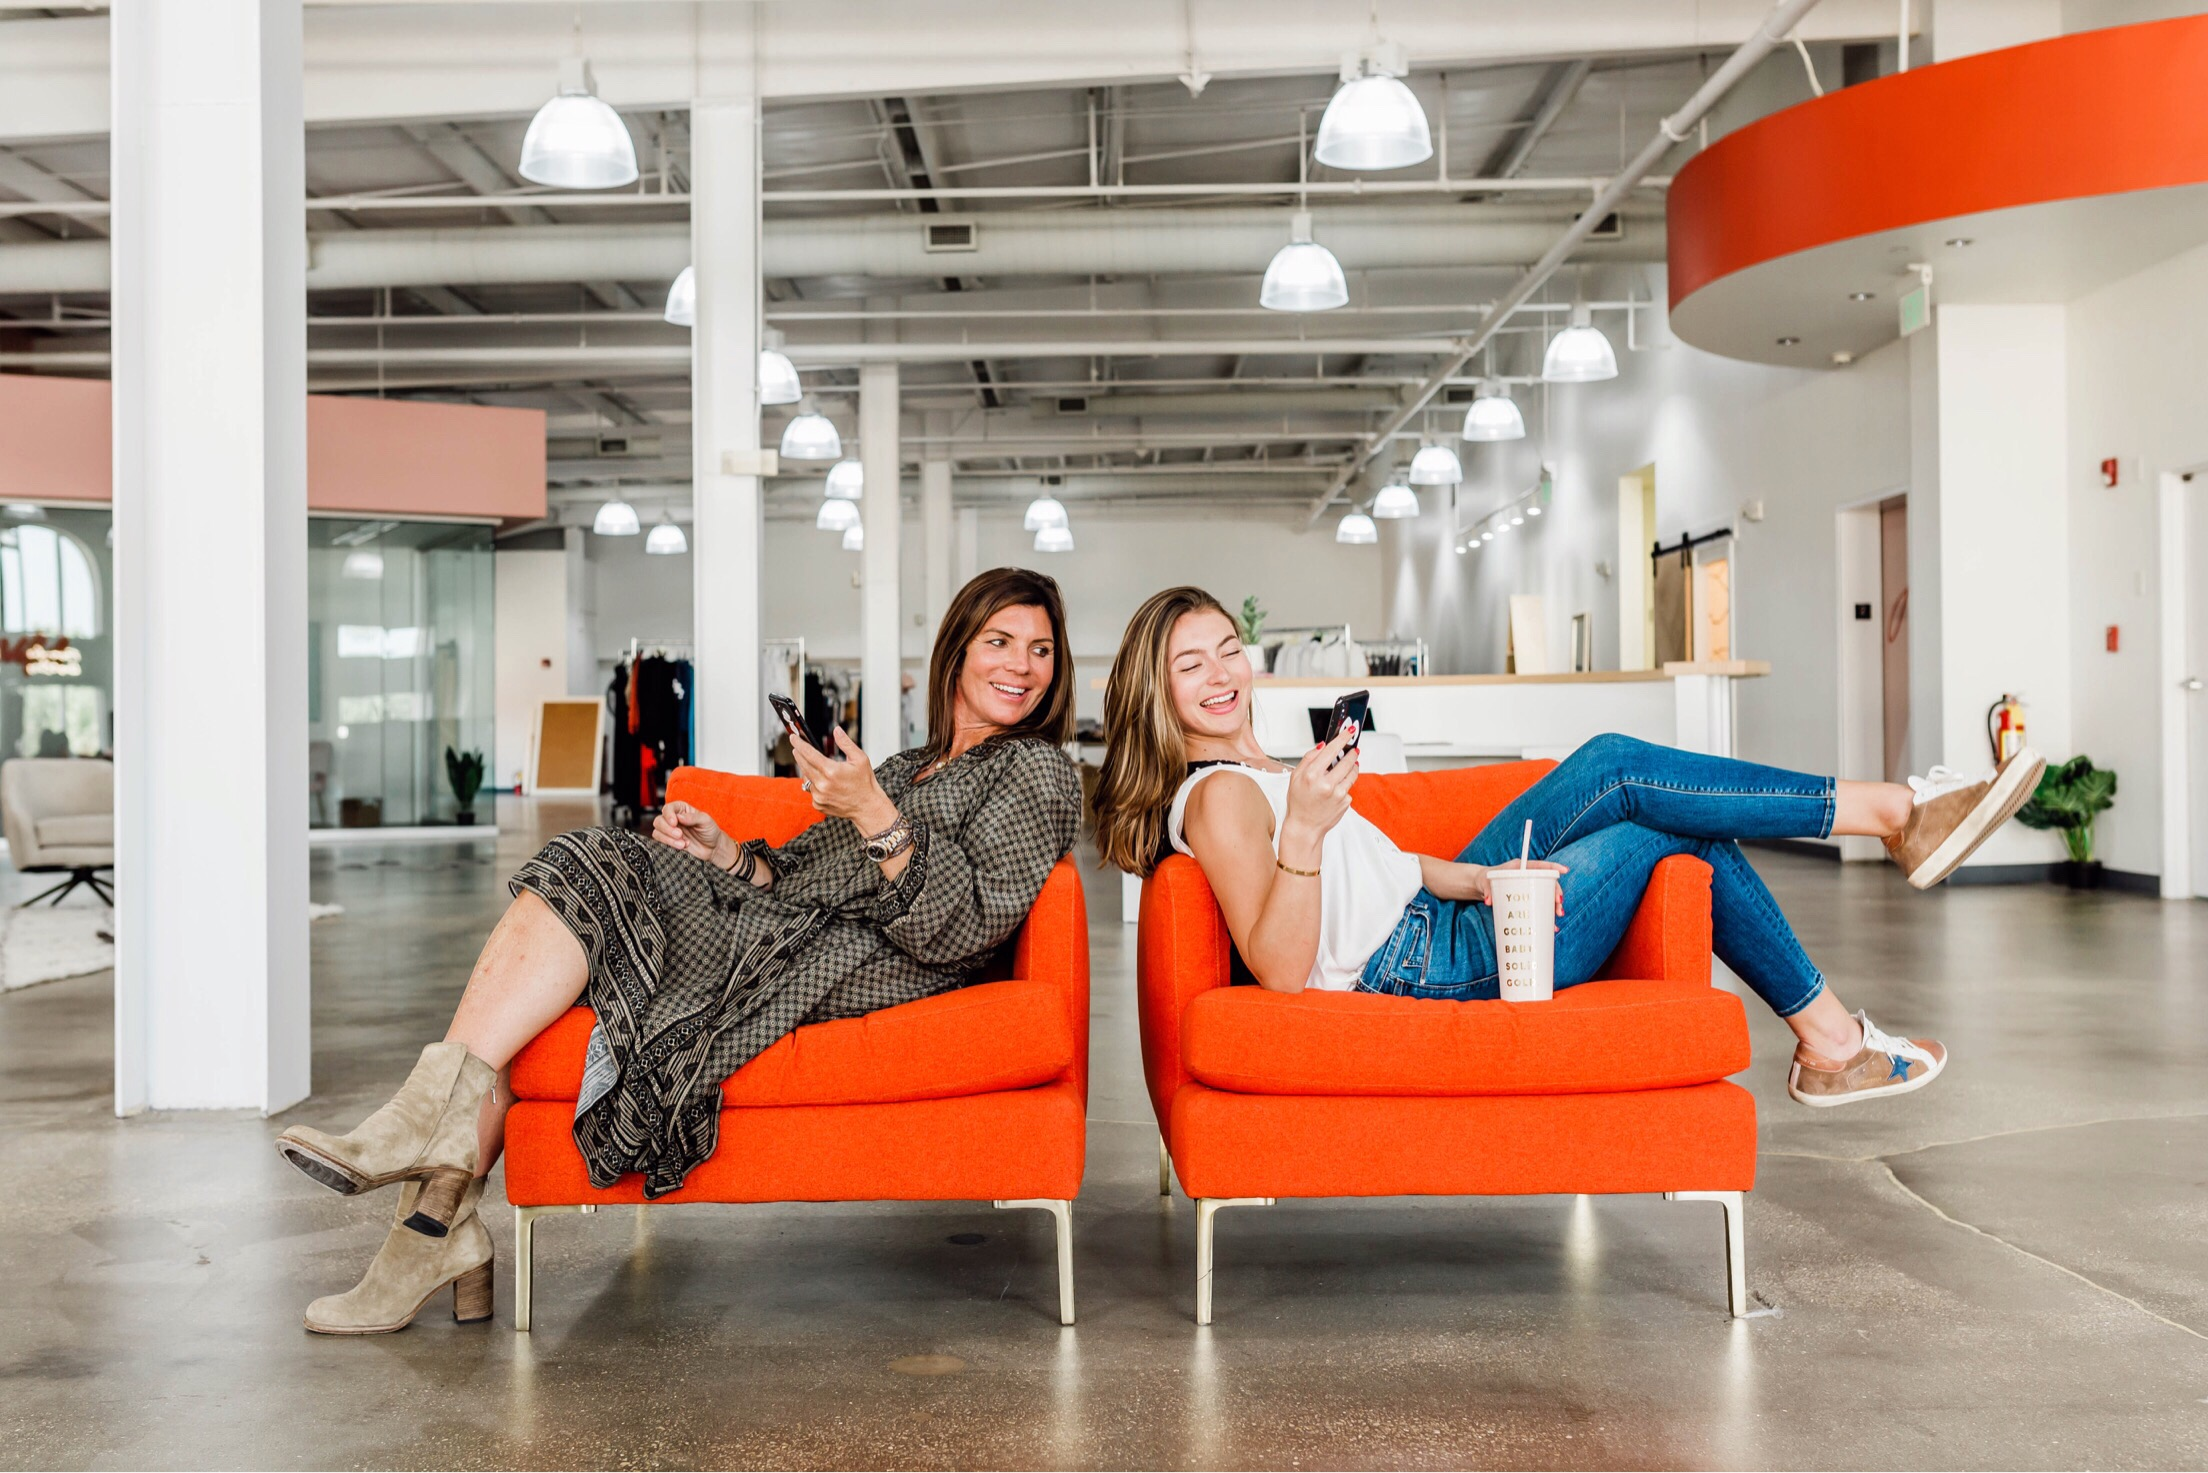 Sabel Bezet, Stylist & Head Buyer (Left), Amber Duncan, Founder & CEO (Right).